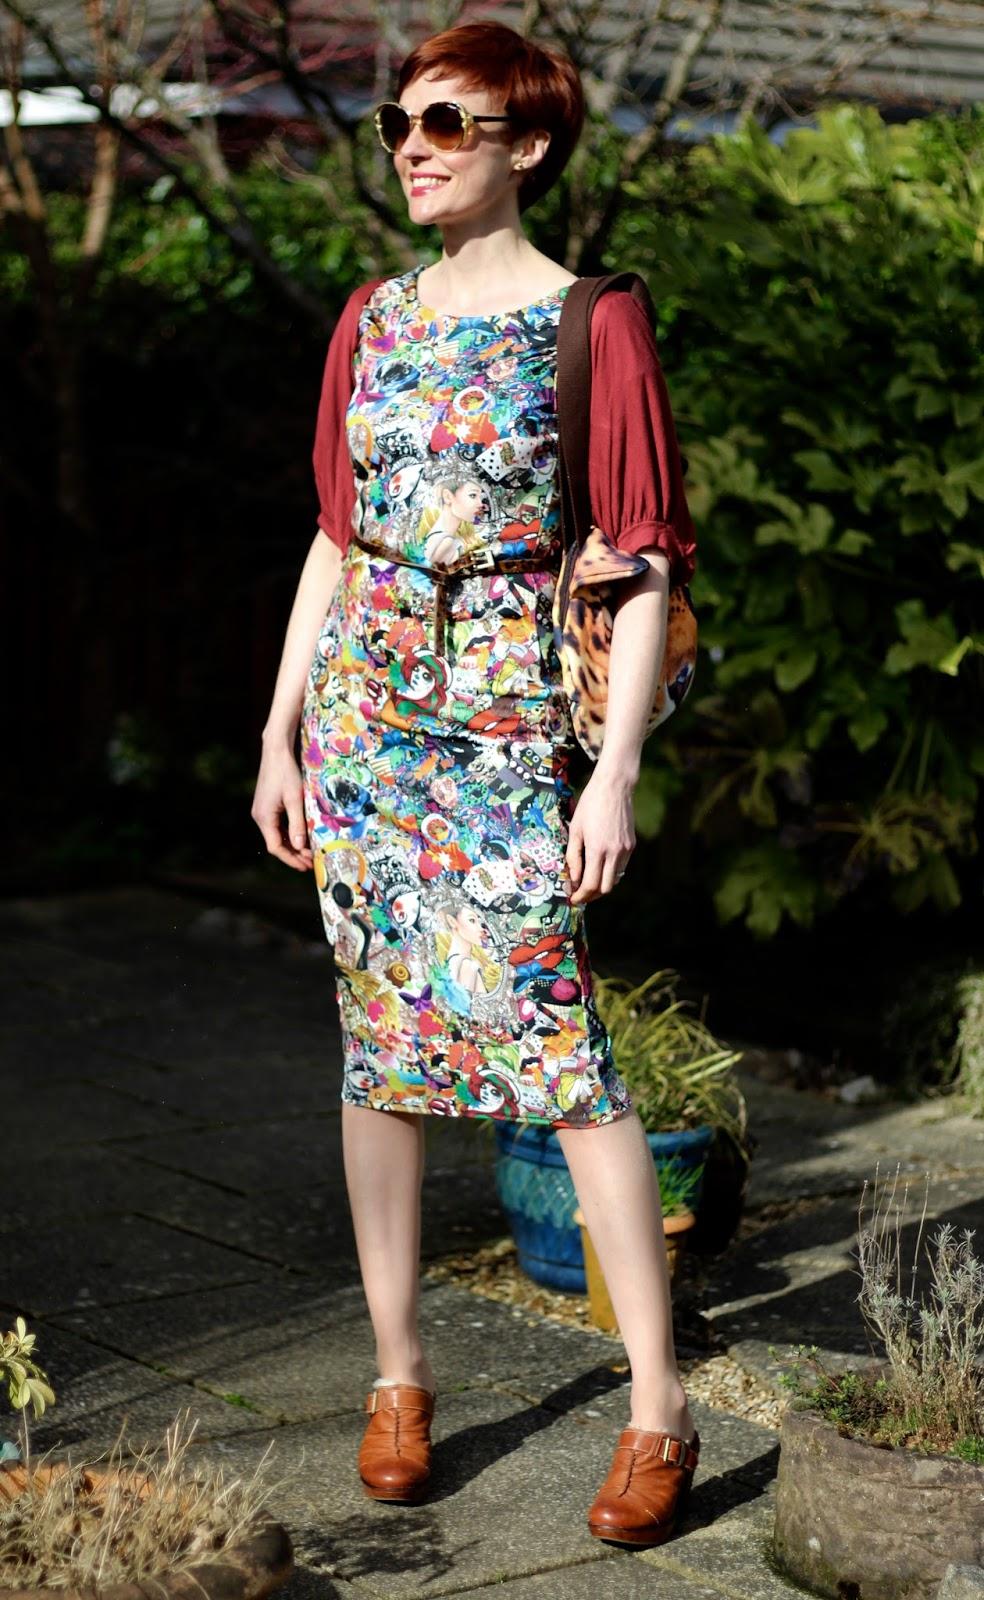 Fake Fabulous | PPP 6 | Graphic Patterned midi dress, leopard bag and belt, Maroon shrug, sheepskin mules.